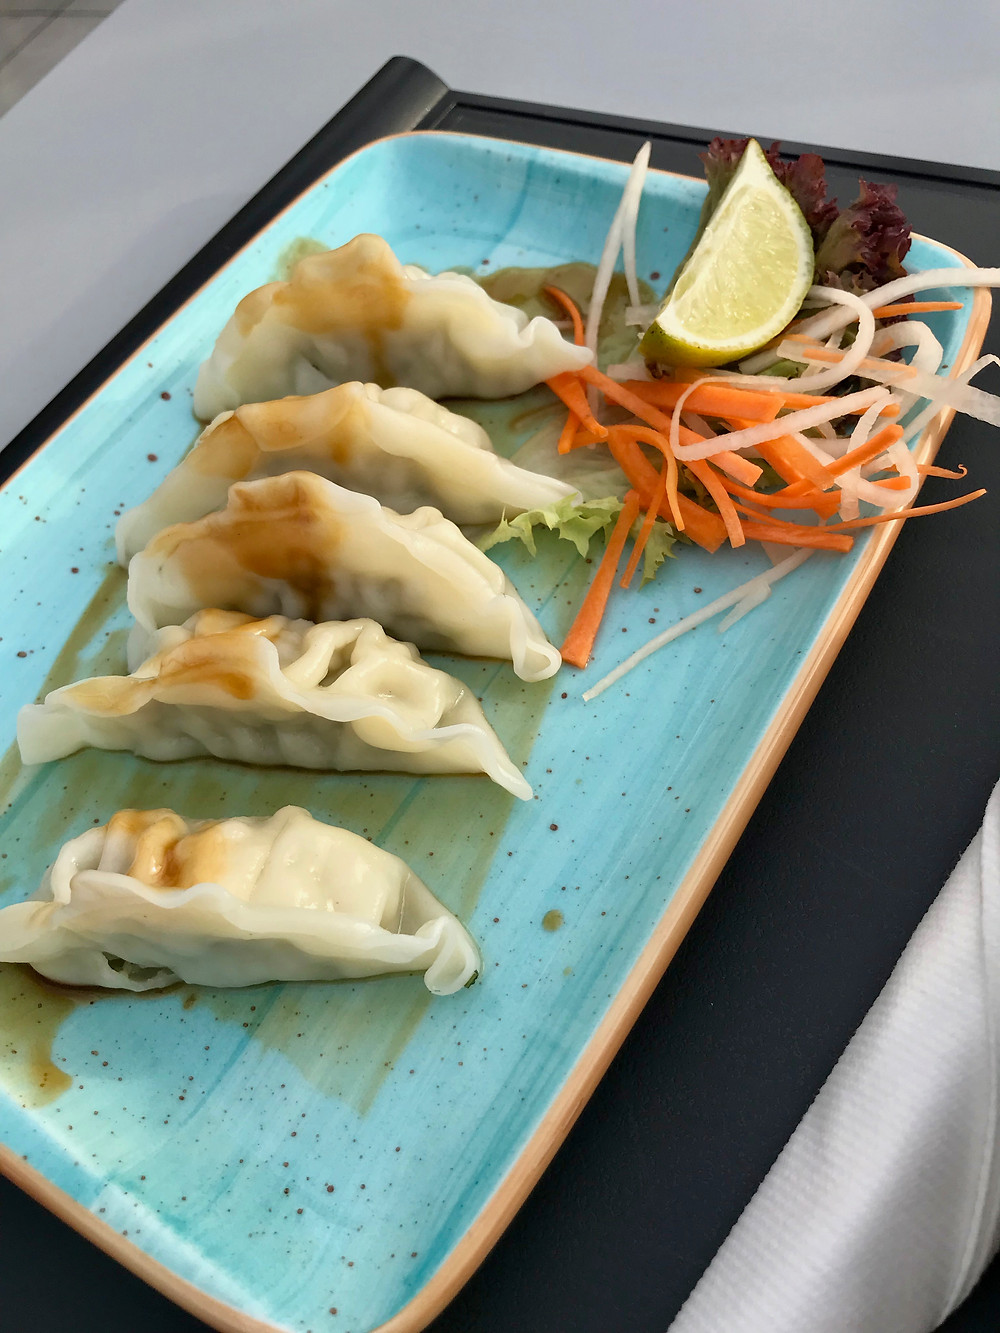 Genki Asian Cafe - carbotree